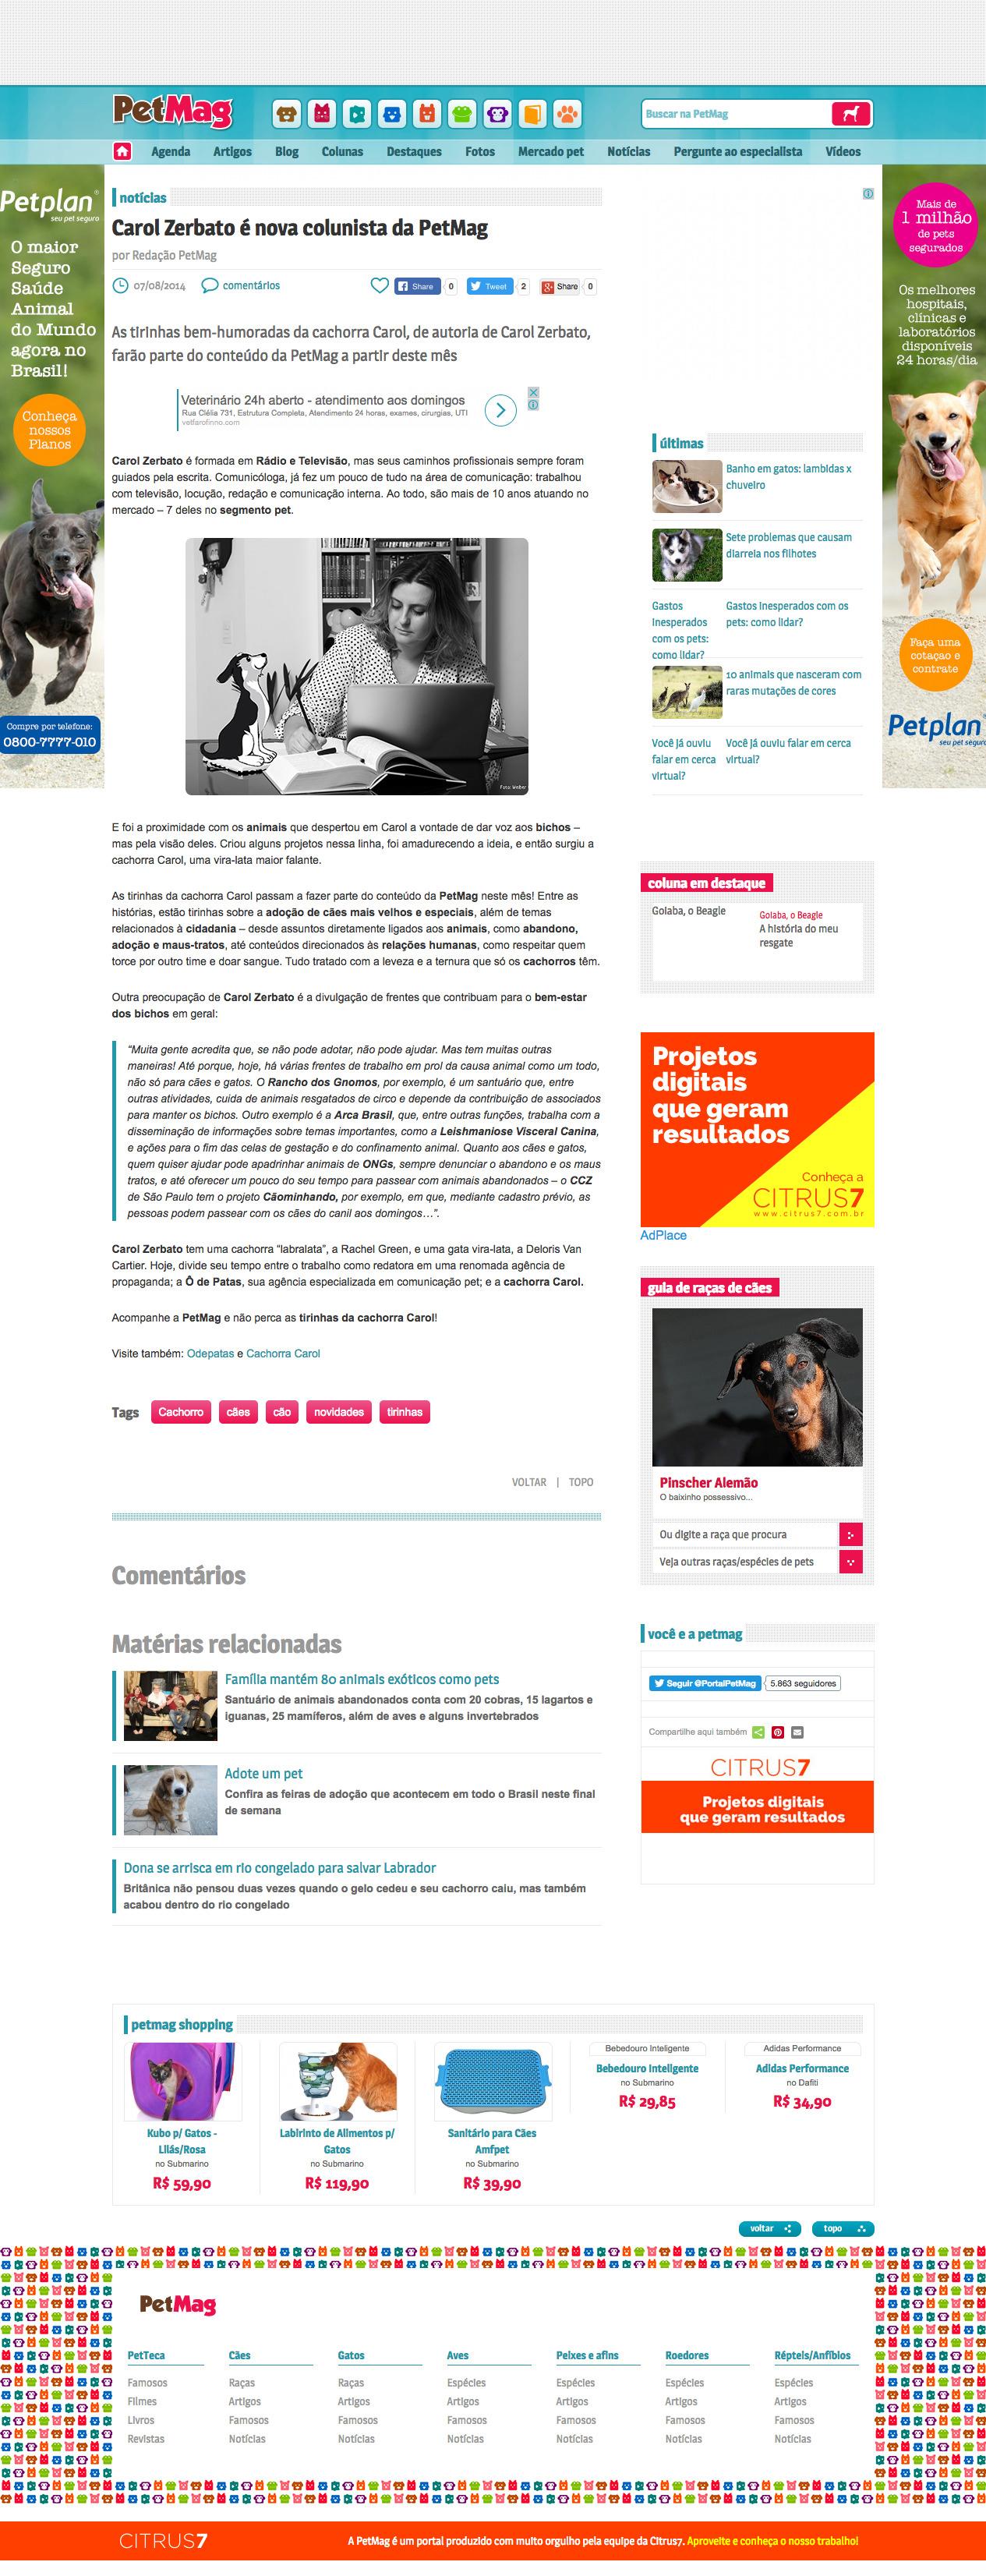 FireShot Capture 9 - Carol Zerbato __ - http___www.petmag.com.br_15959_caro